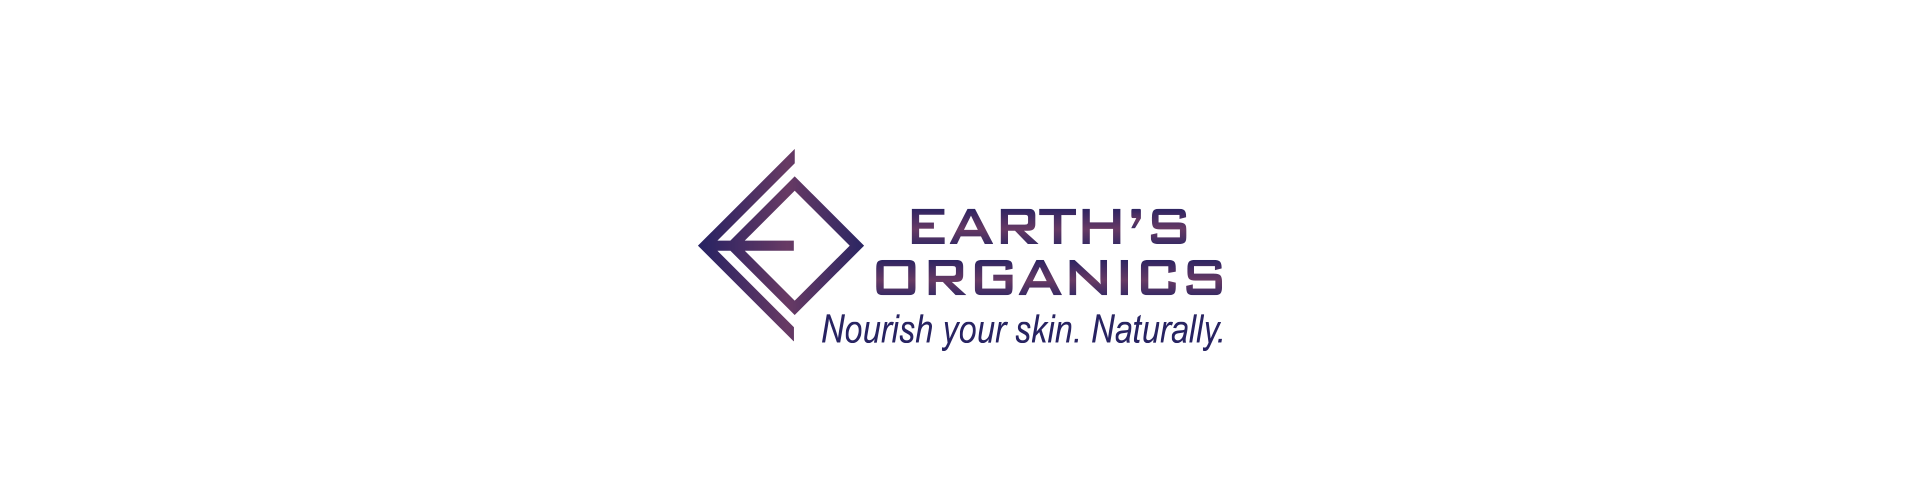 Horizontal logo with slogan